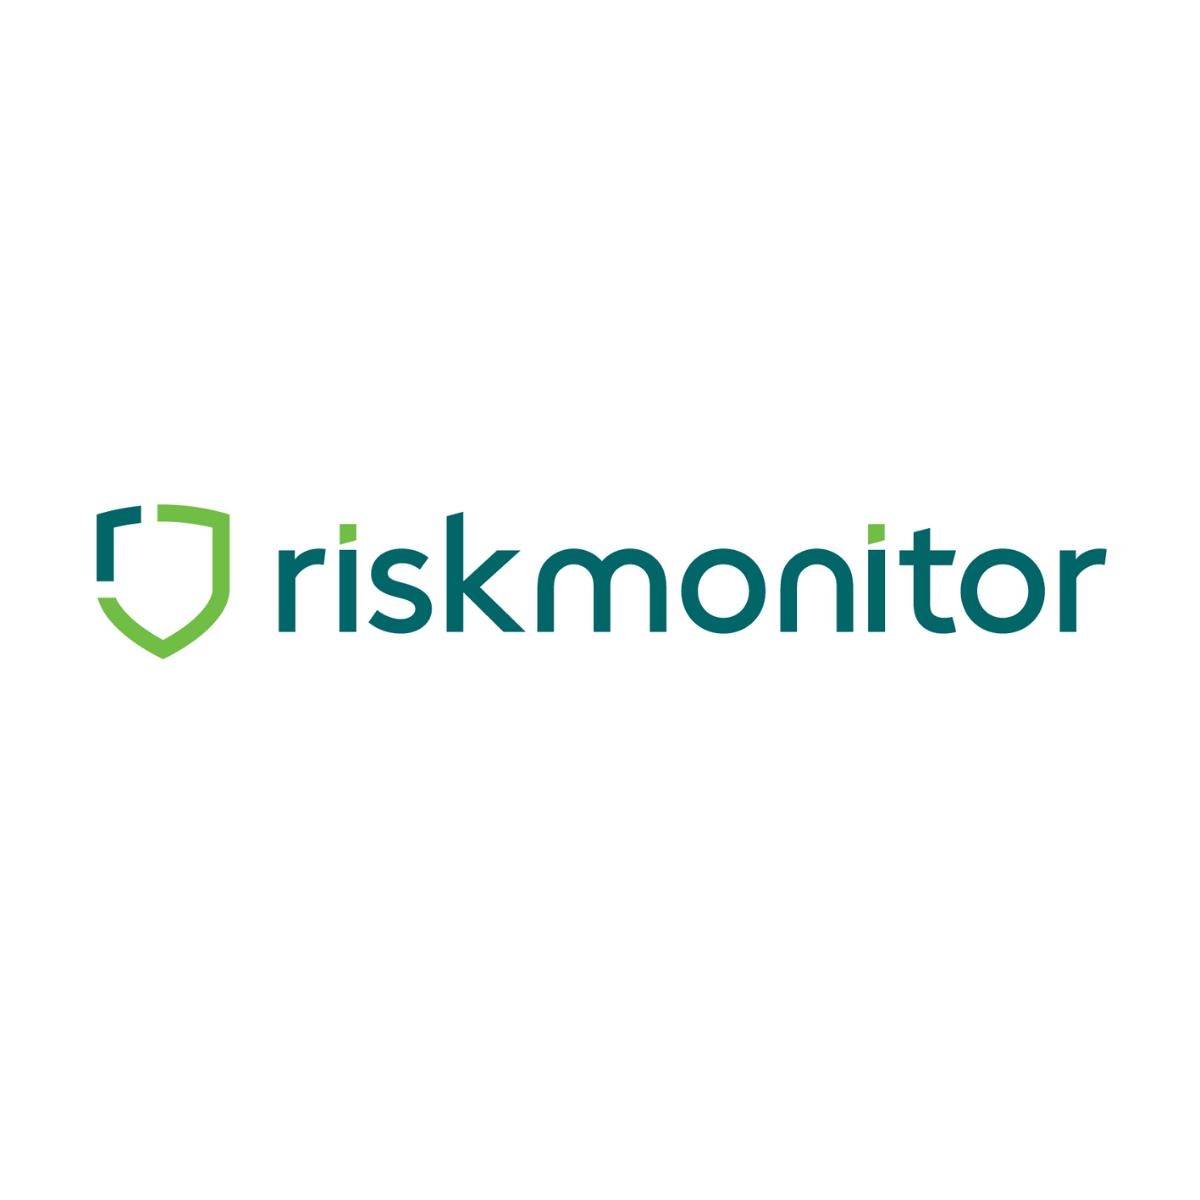 Riskmonitor